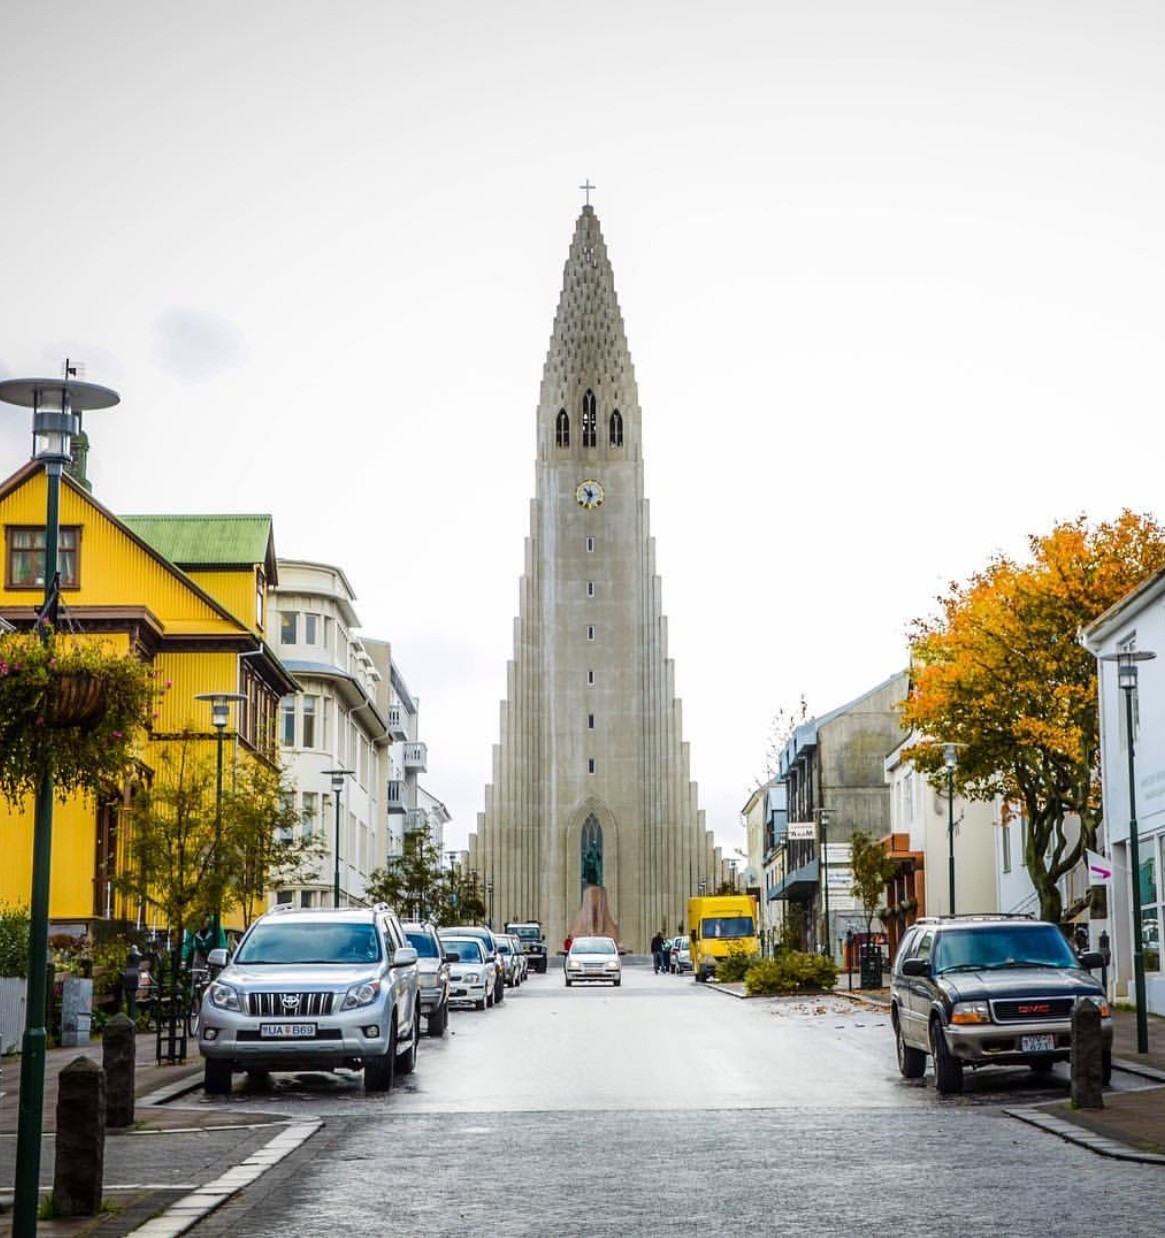 la-capitale-islandese-3e981a11d2a655947f